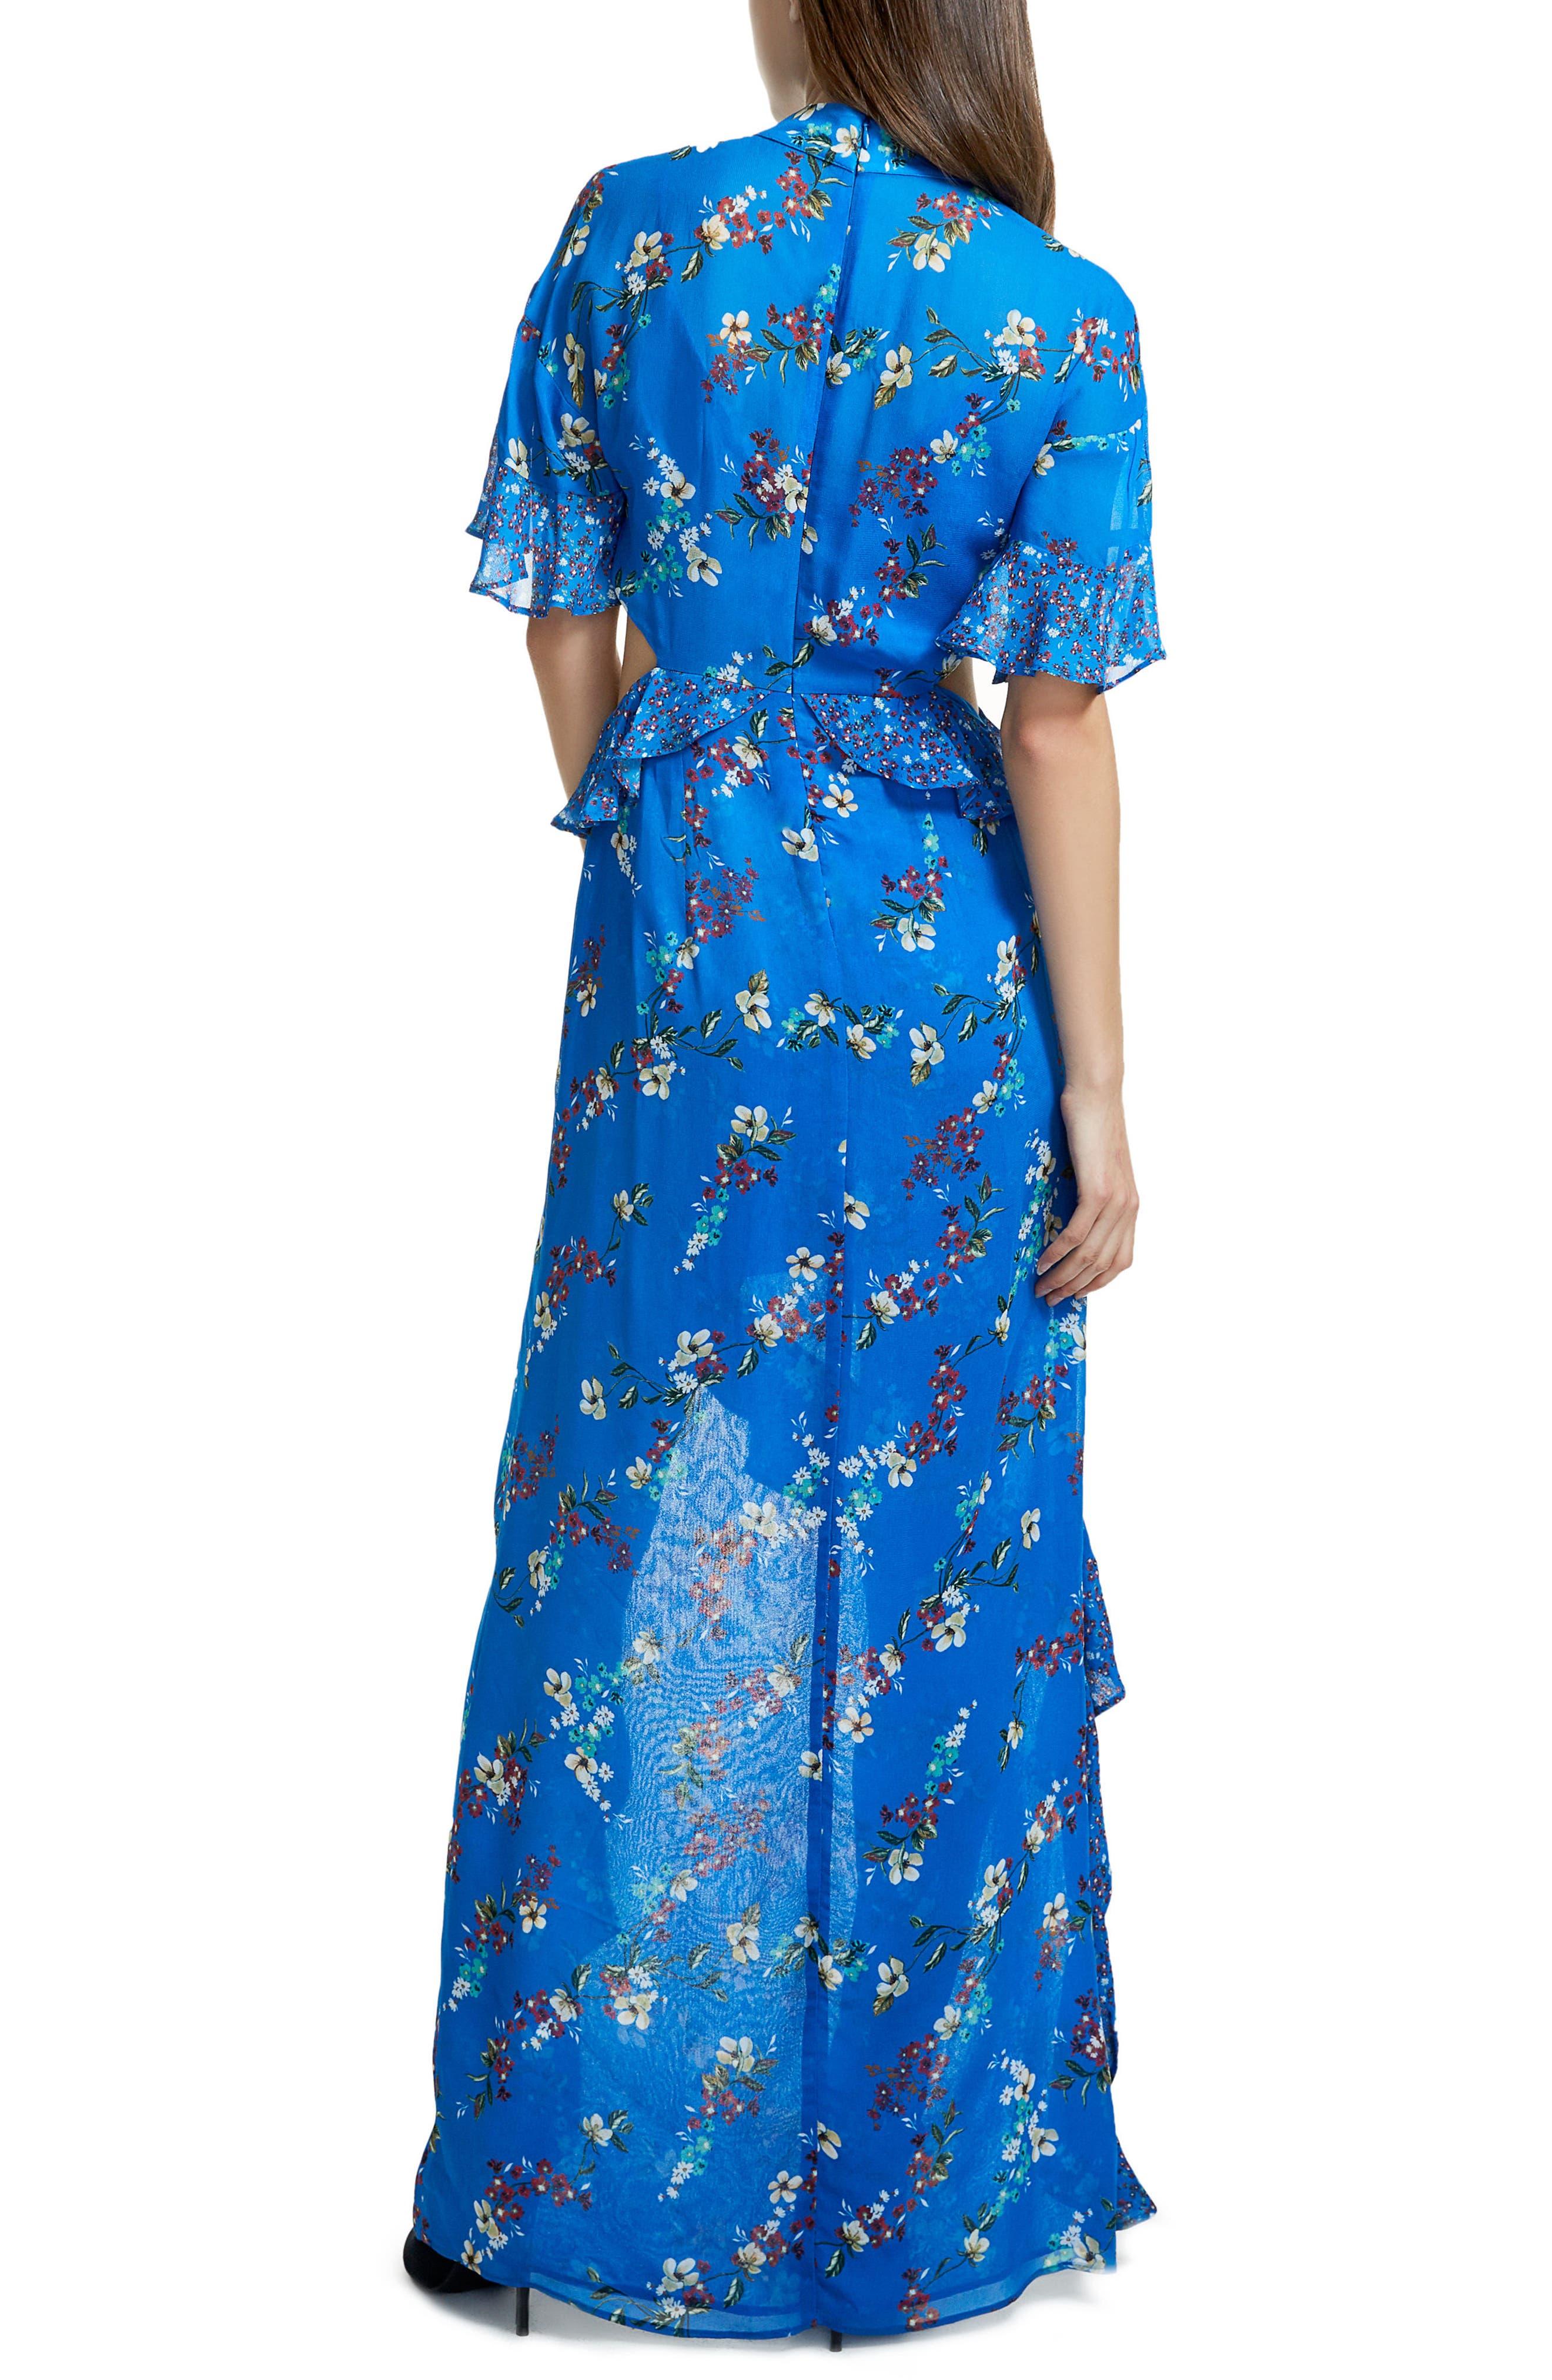 Melsa Cutout Maxi Dress,                             Alternate thumbnail 2, color,